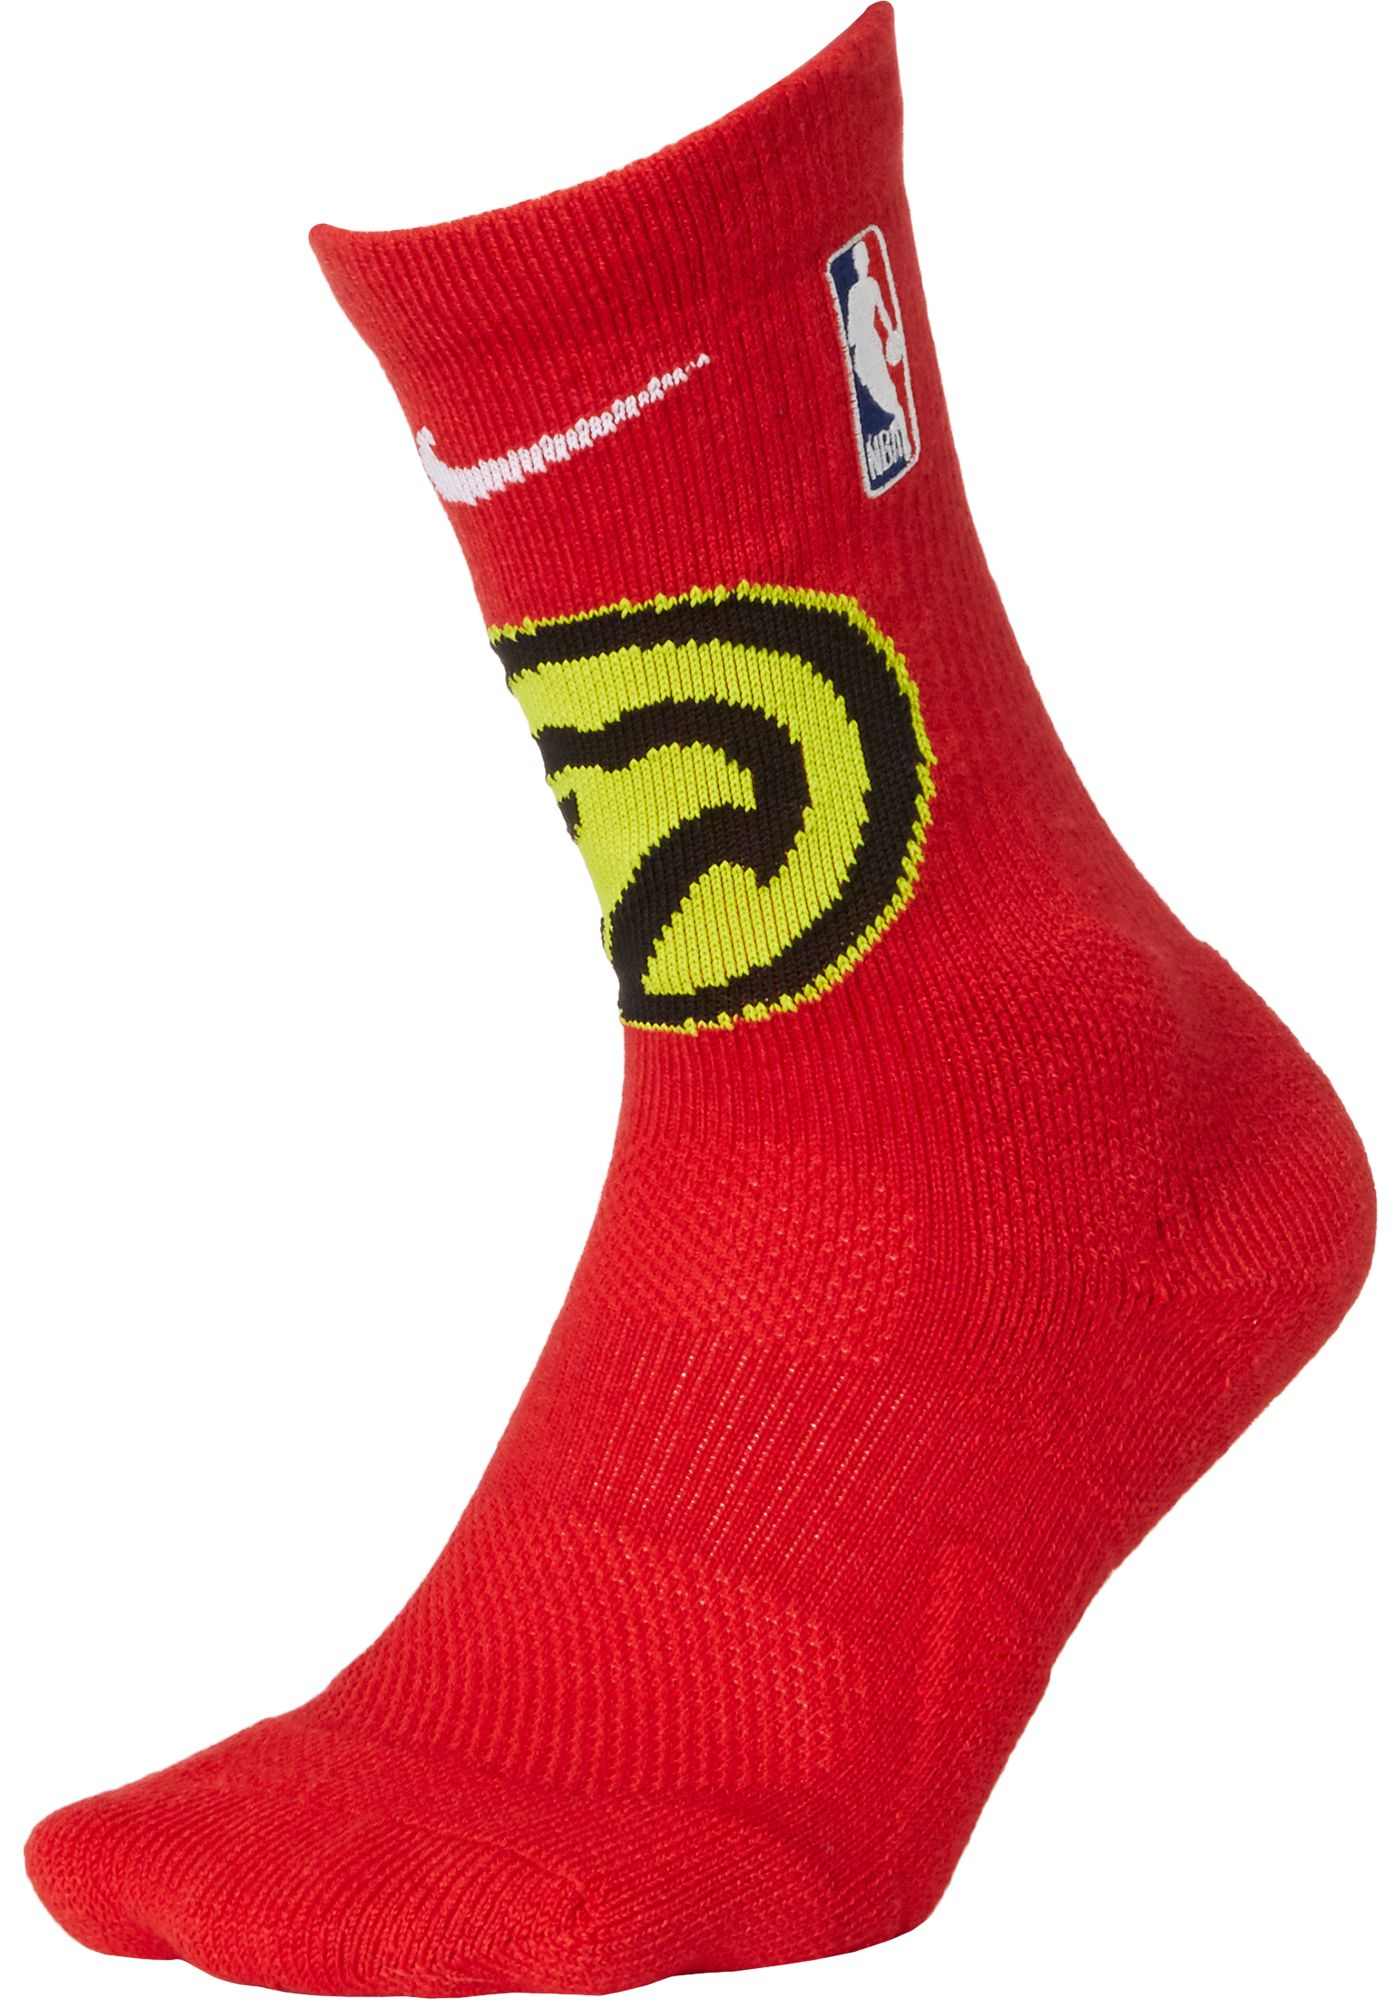 Nike Atlanta Hawks Elite Crew Socks